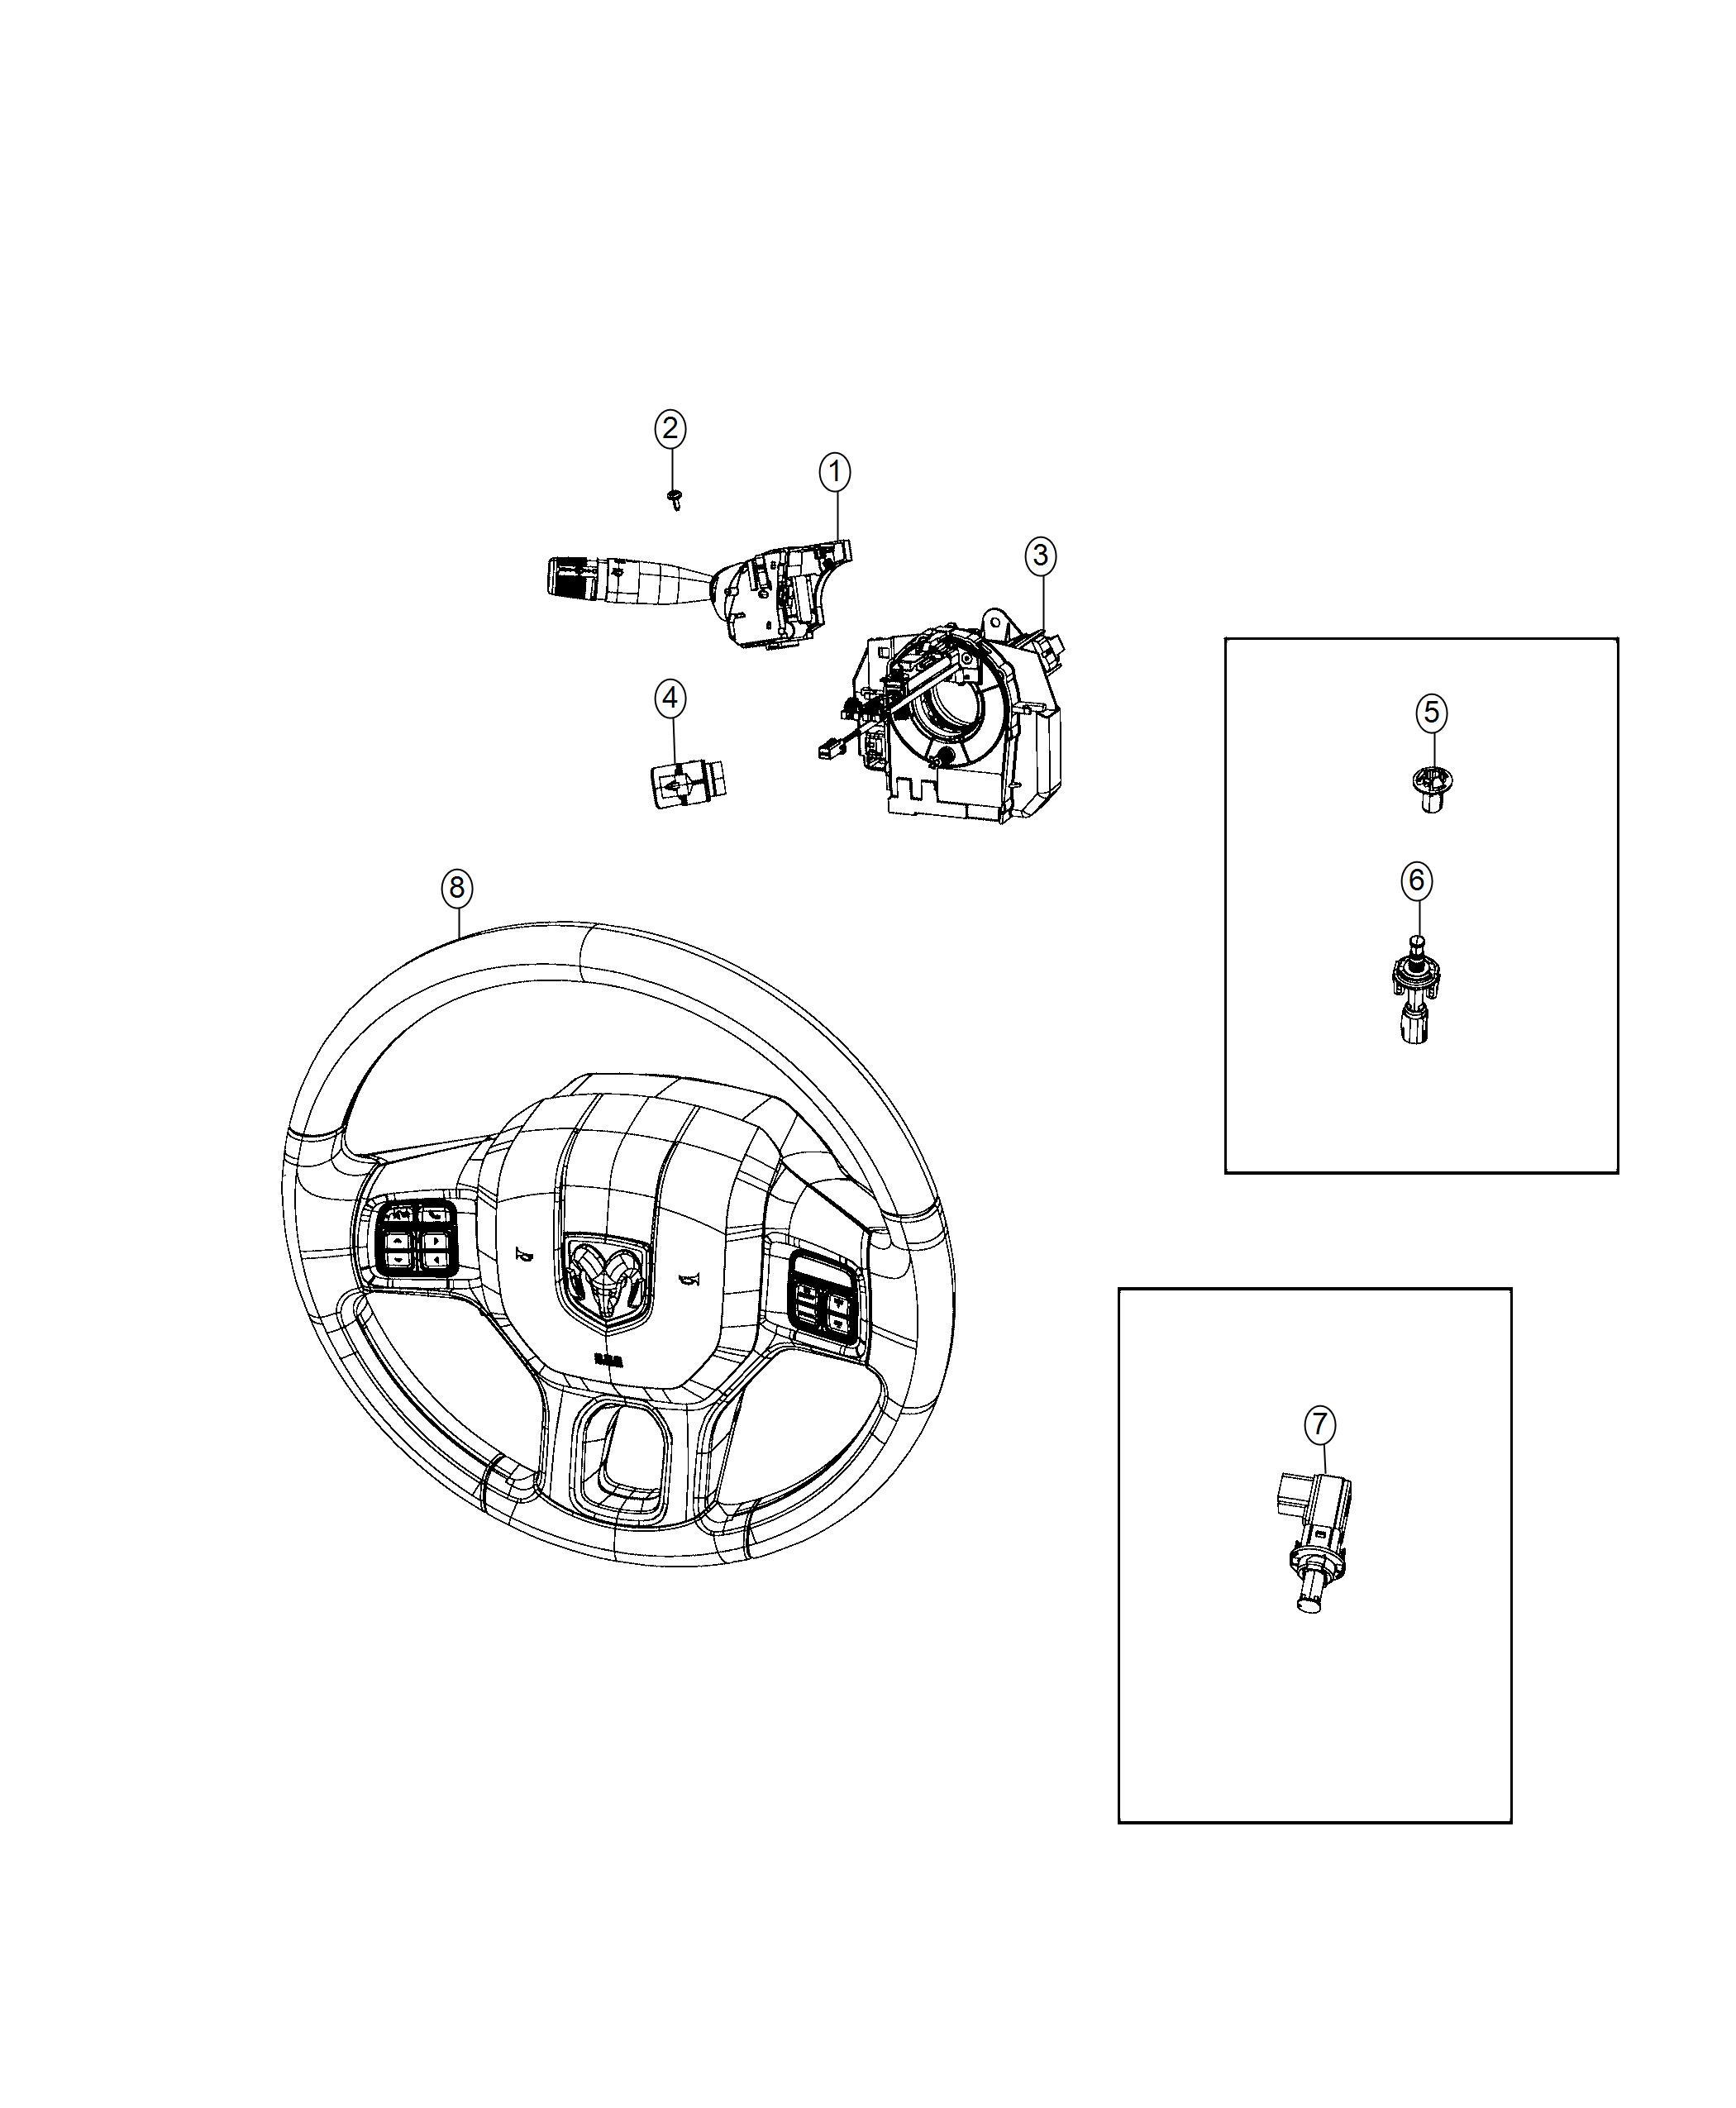 Ram Screw Tapping Round Head M4x1 40x14 00